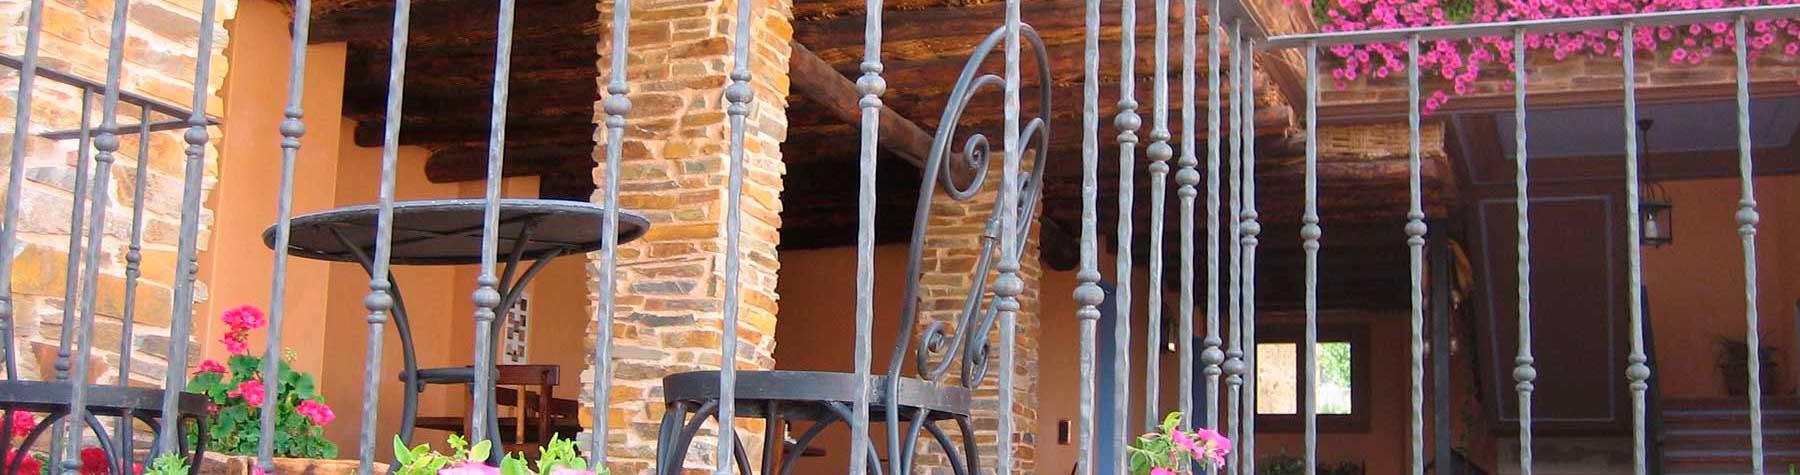 casa-rural-los-pedregales-terraza-1800x475